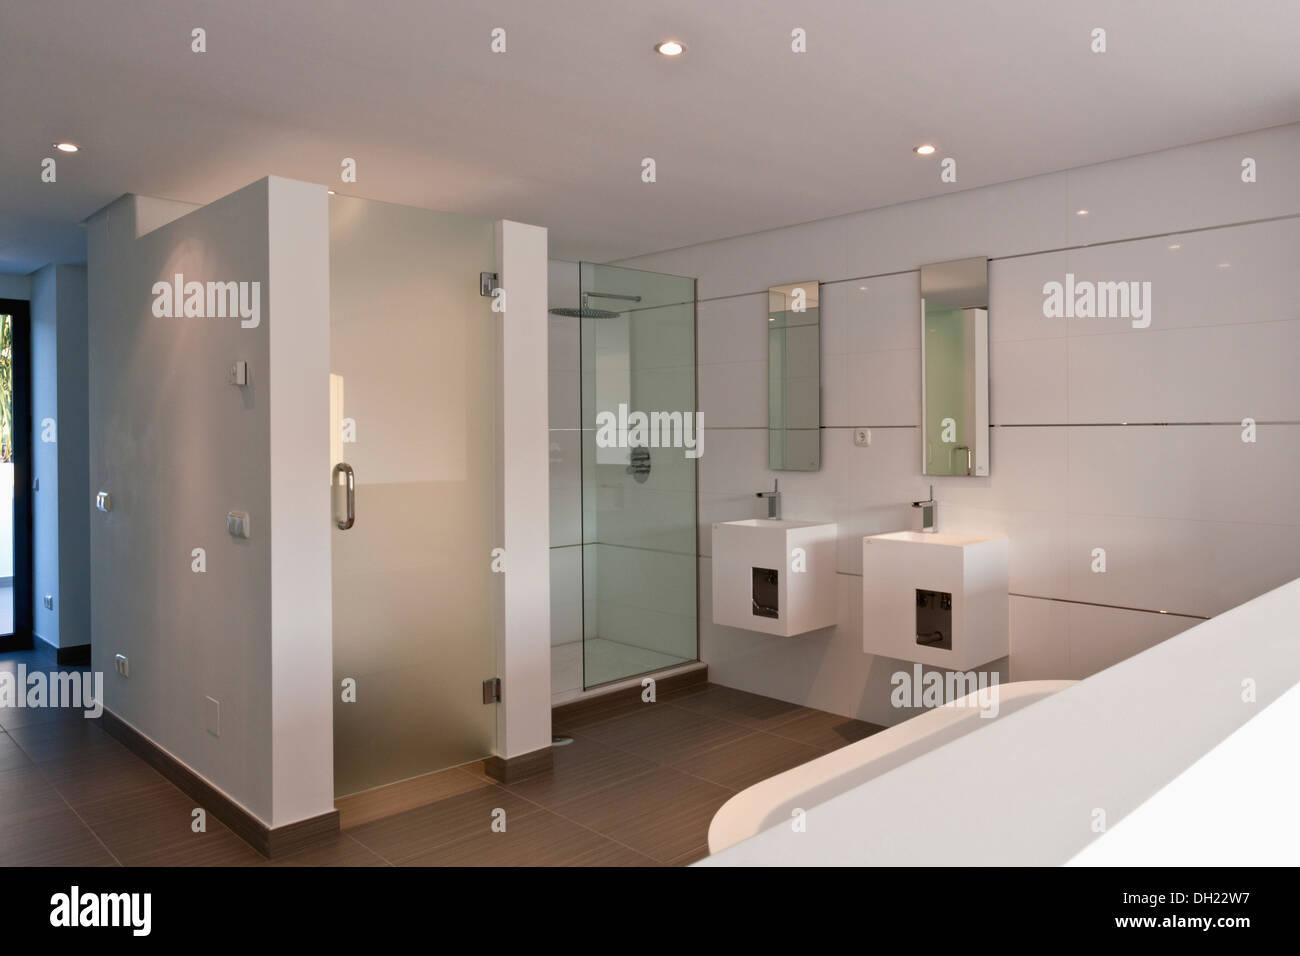 Bathroom Shower Door Monochromatic Stock Photos & Bathroom Shower ...